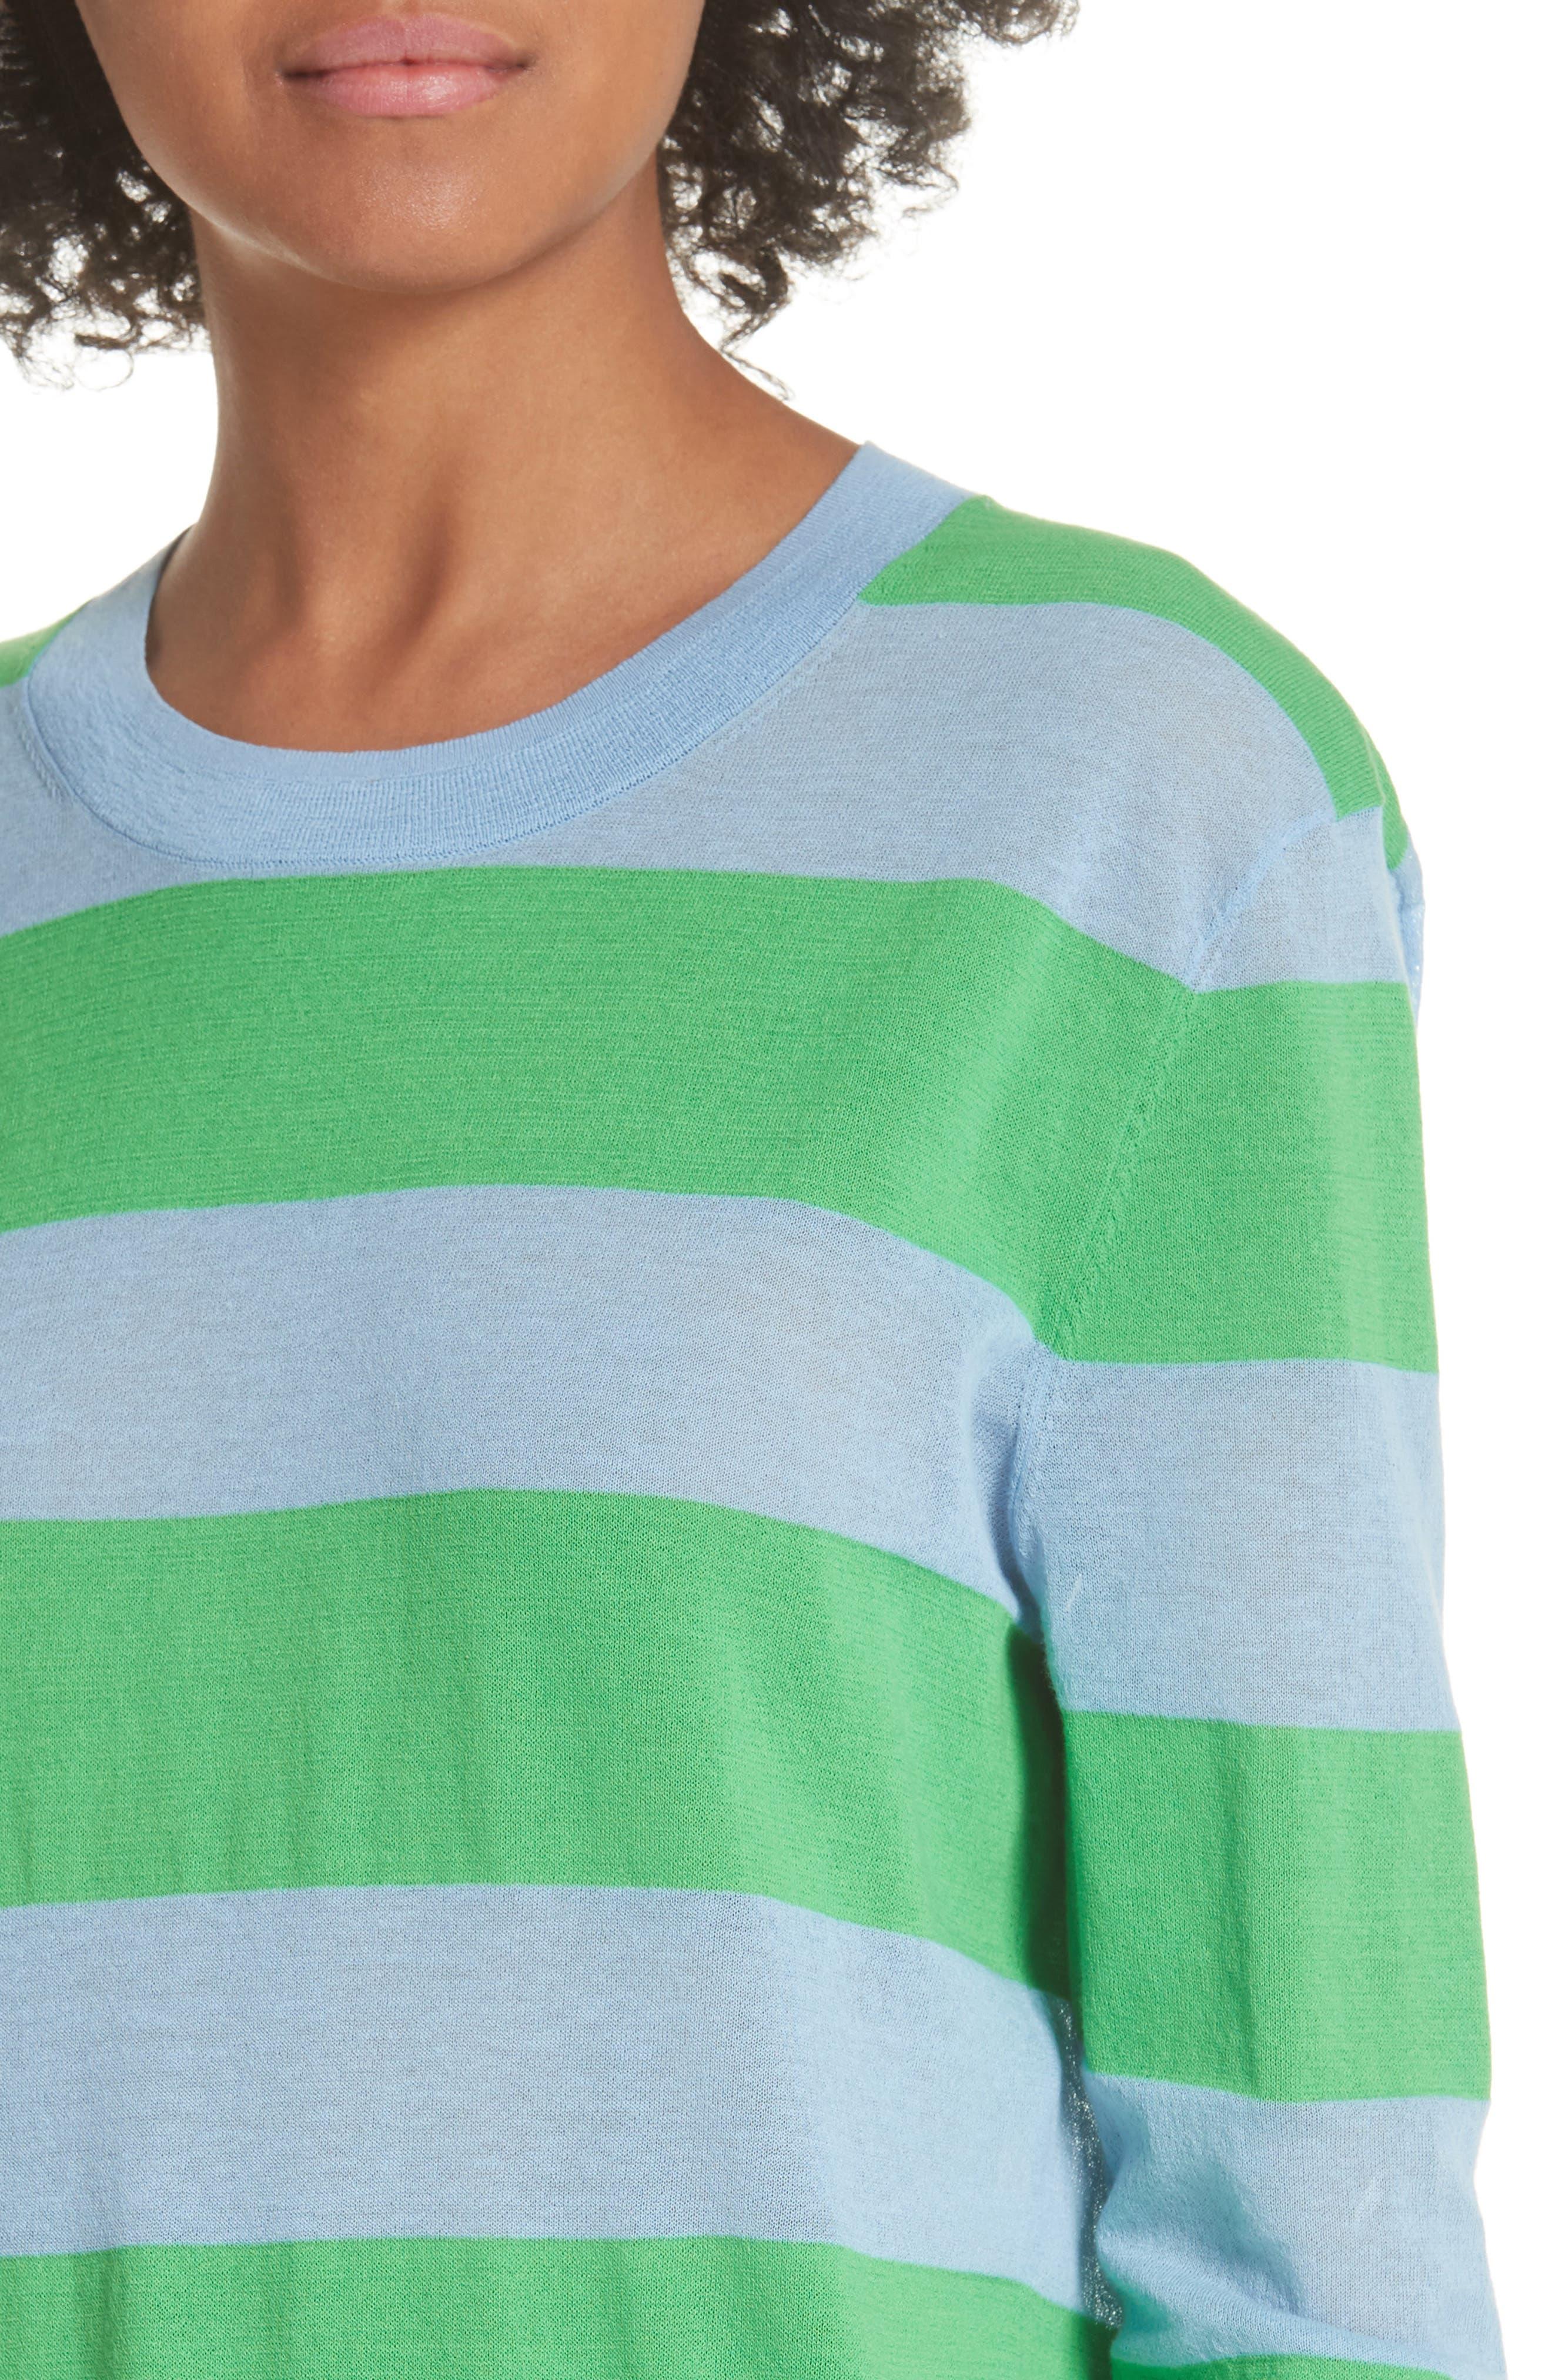 Diane von Furstenberg Colorblock Stripe Sweater,                             Alternate thumbnail 4, color,                             415